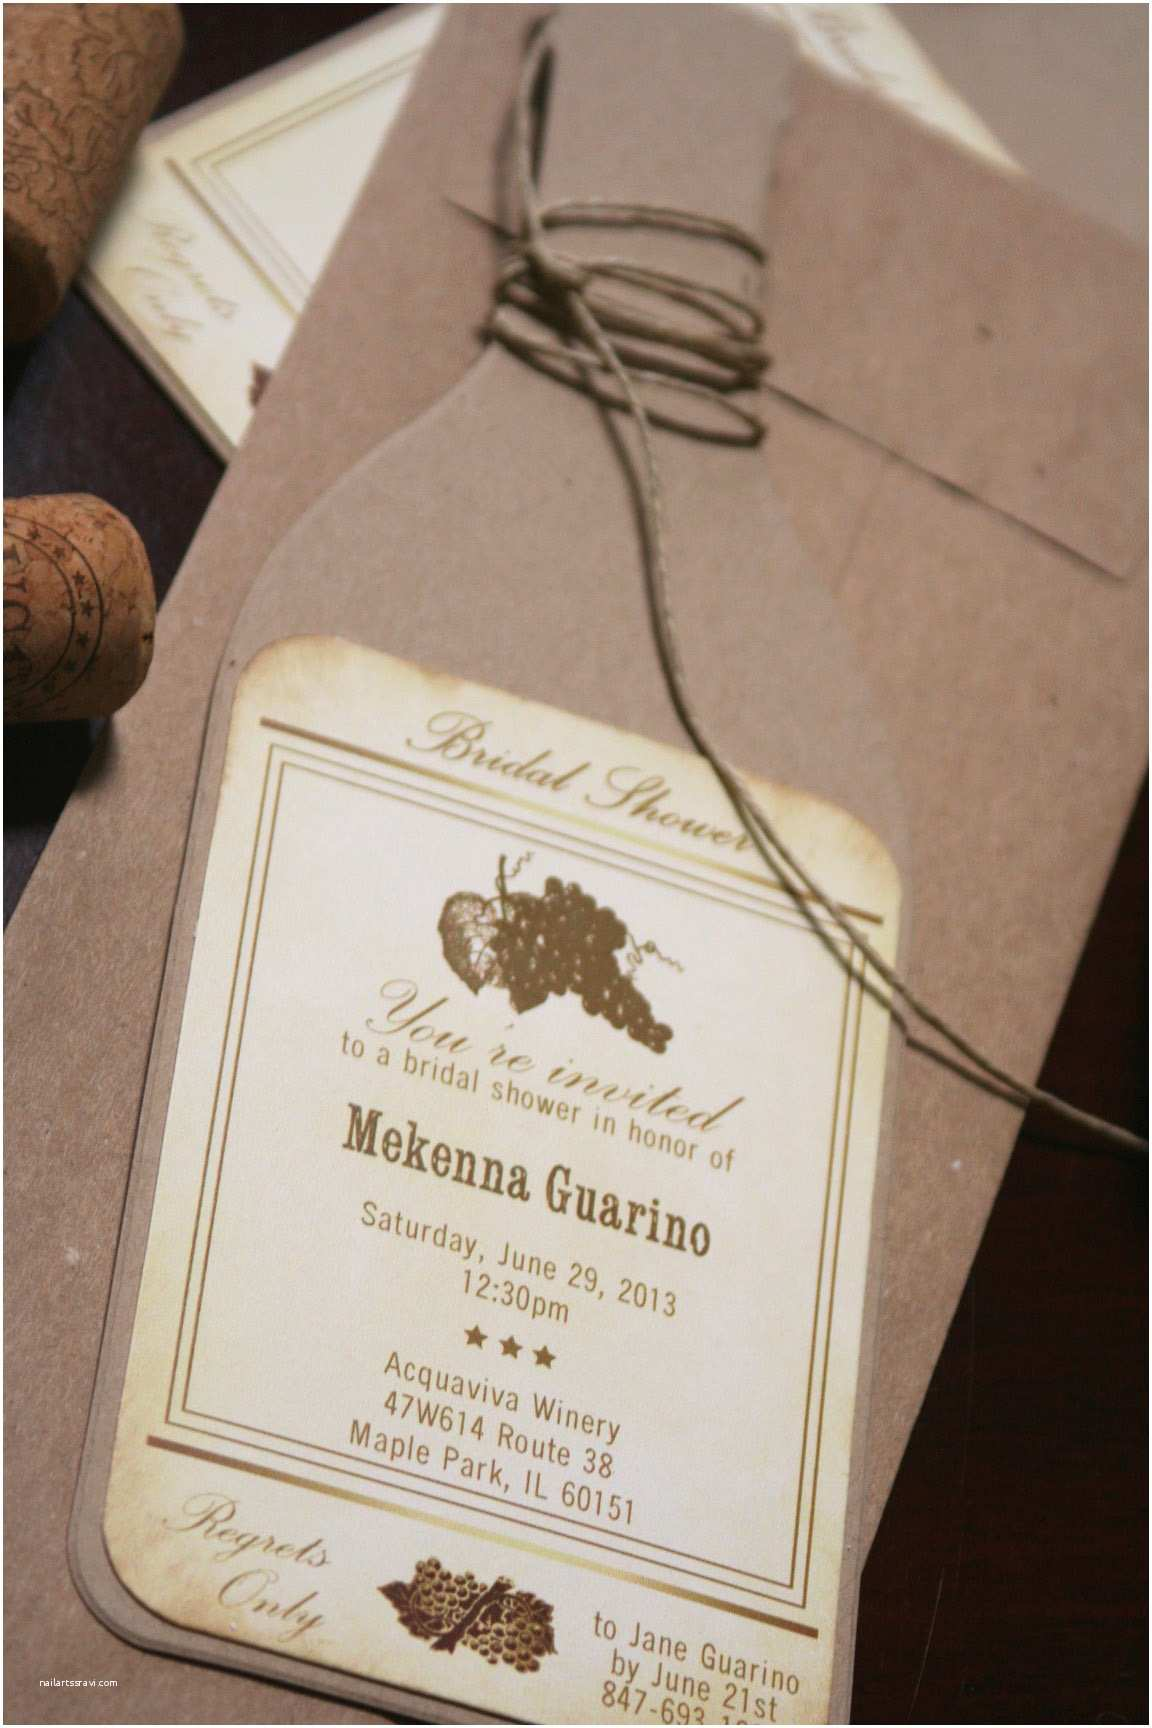 Wedding Invitation Kits Target Wedding Invitations at Tar Various Invitation Card Design